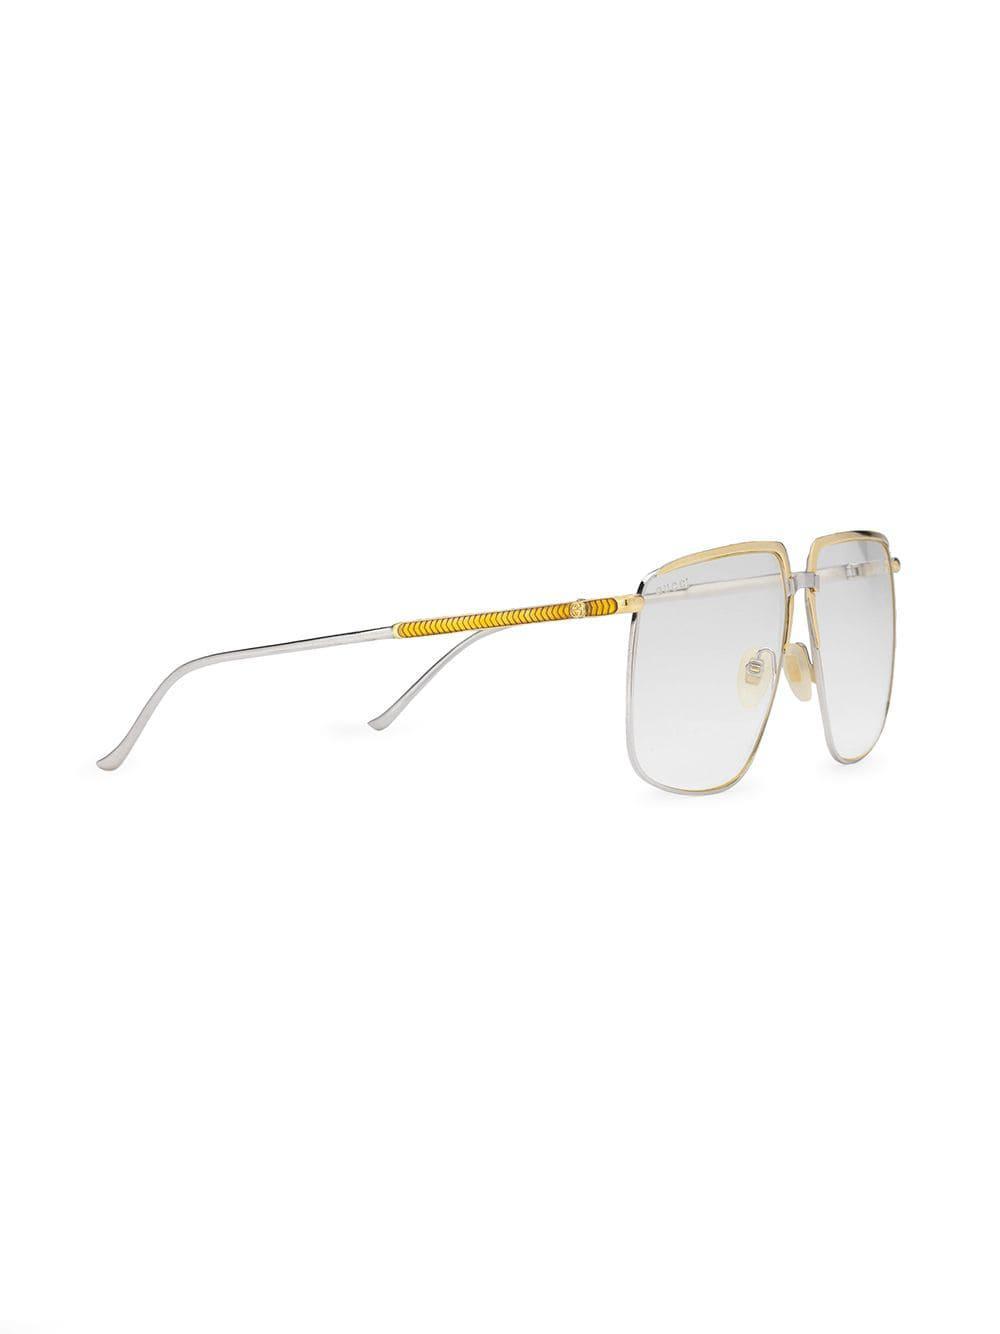 0b31a5dbc3e Lyst - Gucci Square-frame Glasses in Metallic